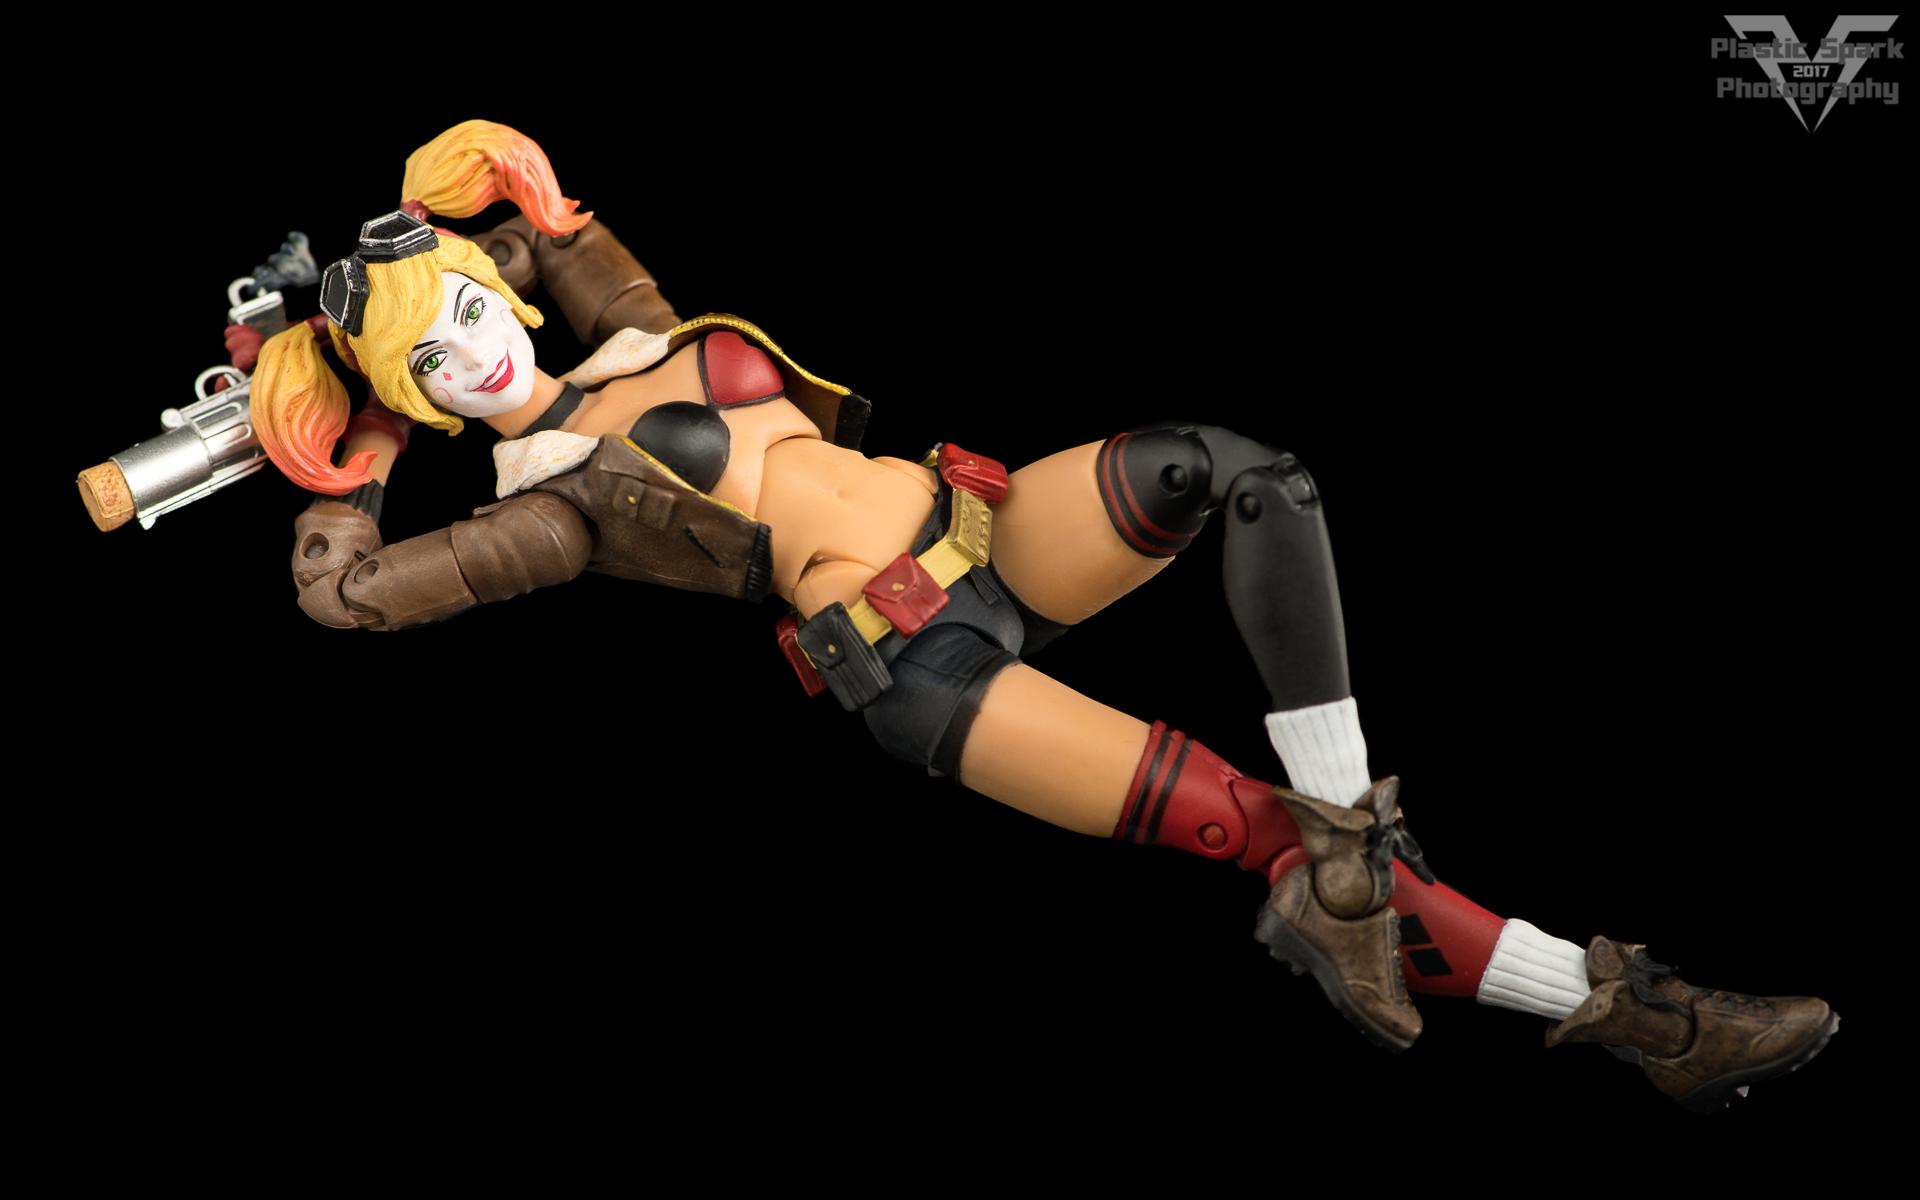 Bombshell-Harley-Quinn-(12-of-12).png